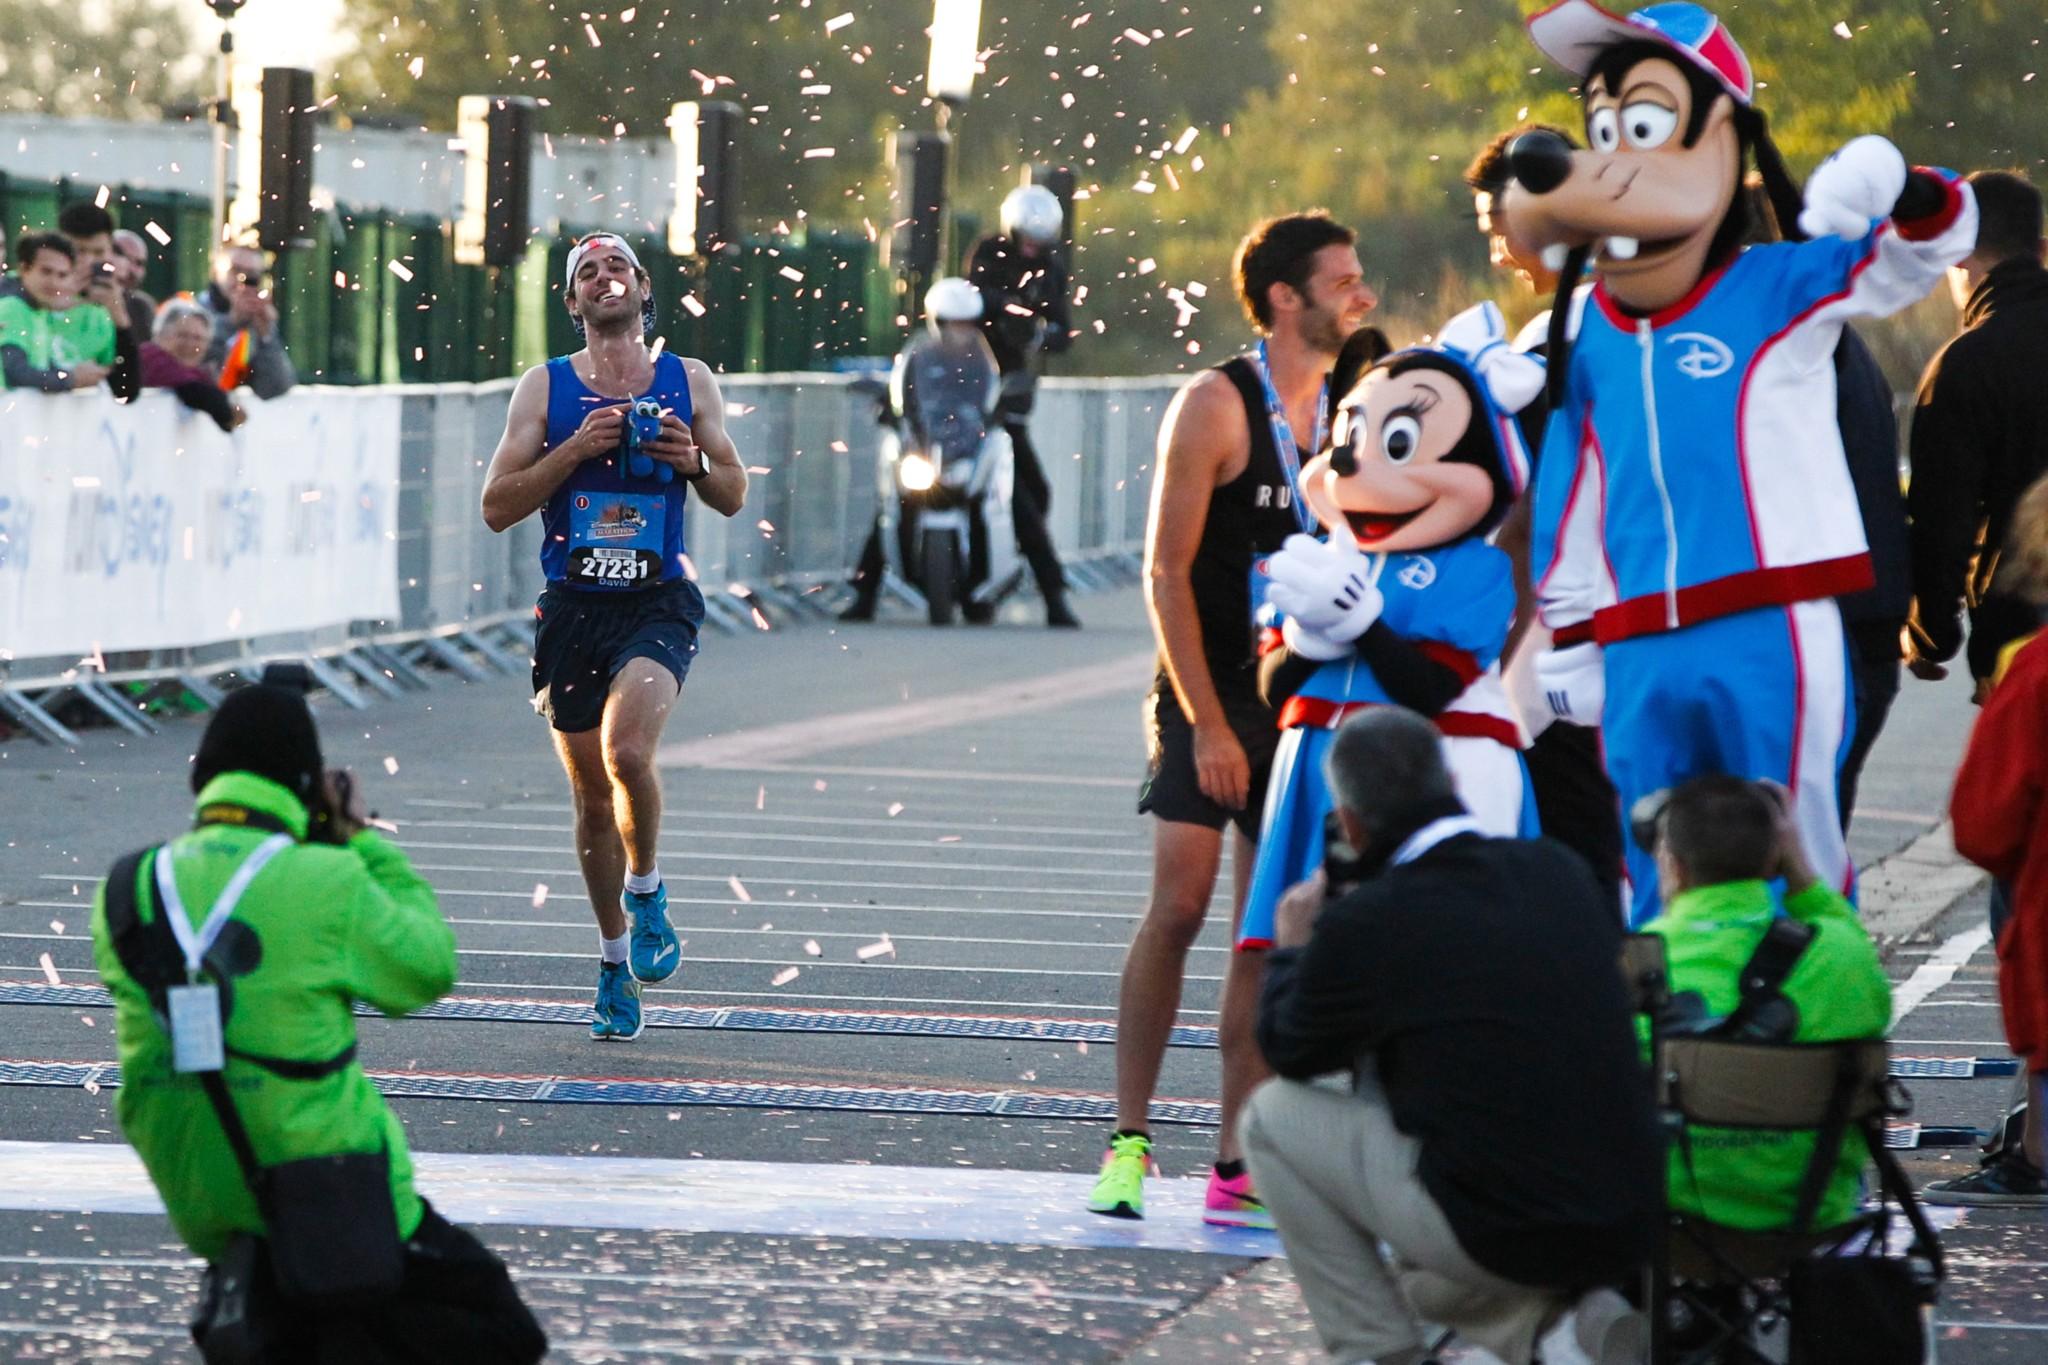 Half Marathon Run Disney in Marne la Vallee